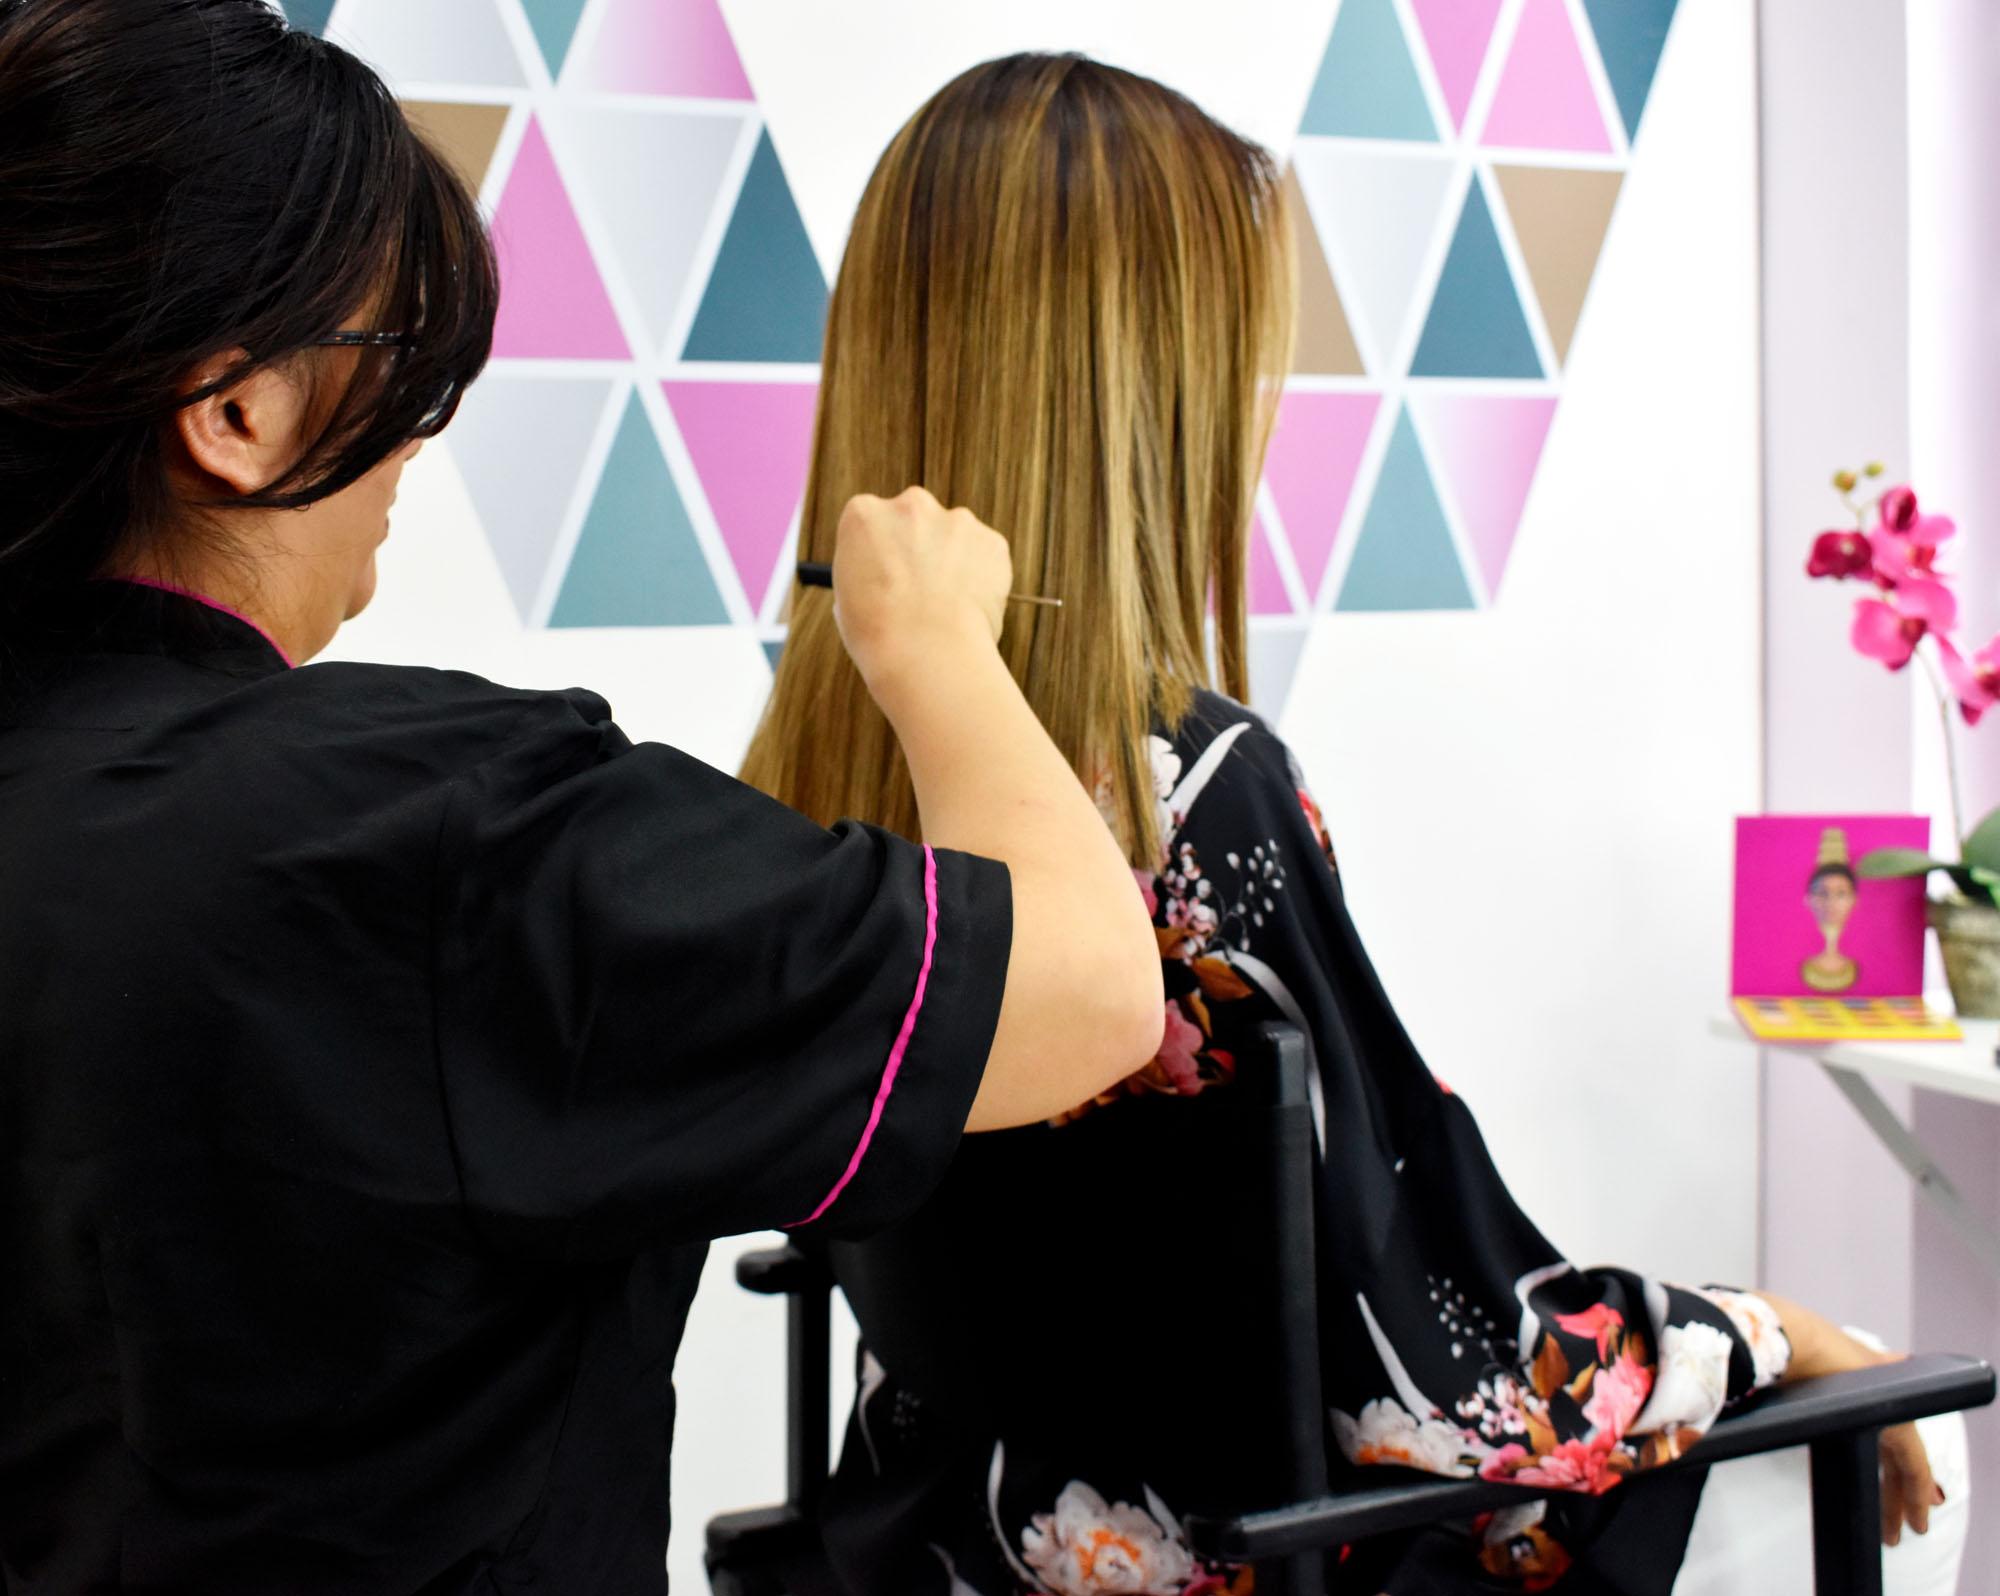 We Love Experience un Beauty Coworking para emprendedores de la Belleza en Guayaquil